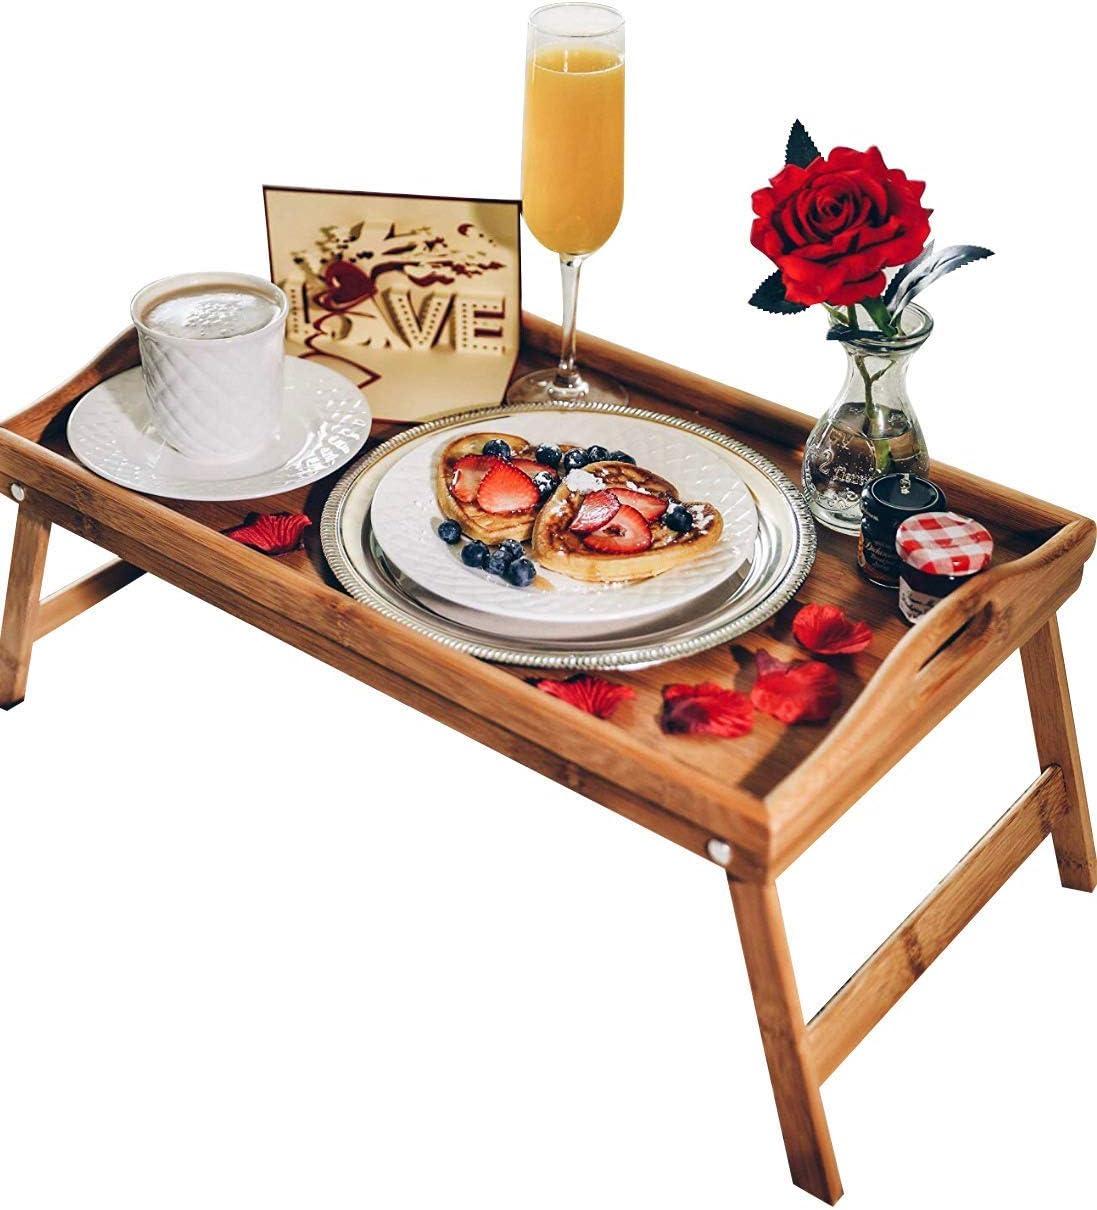 Amazon Com Romantic Breakfast In Bed Gift Box Romantic Gifts For Her Romantic Gifts For Couples Breakfast Gift Basket Home Kitchen